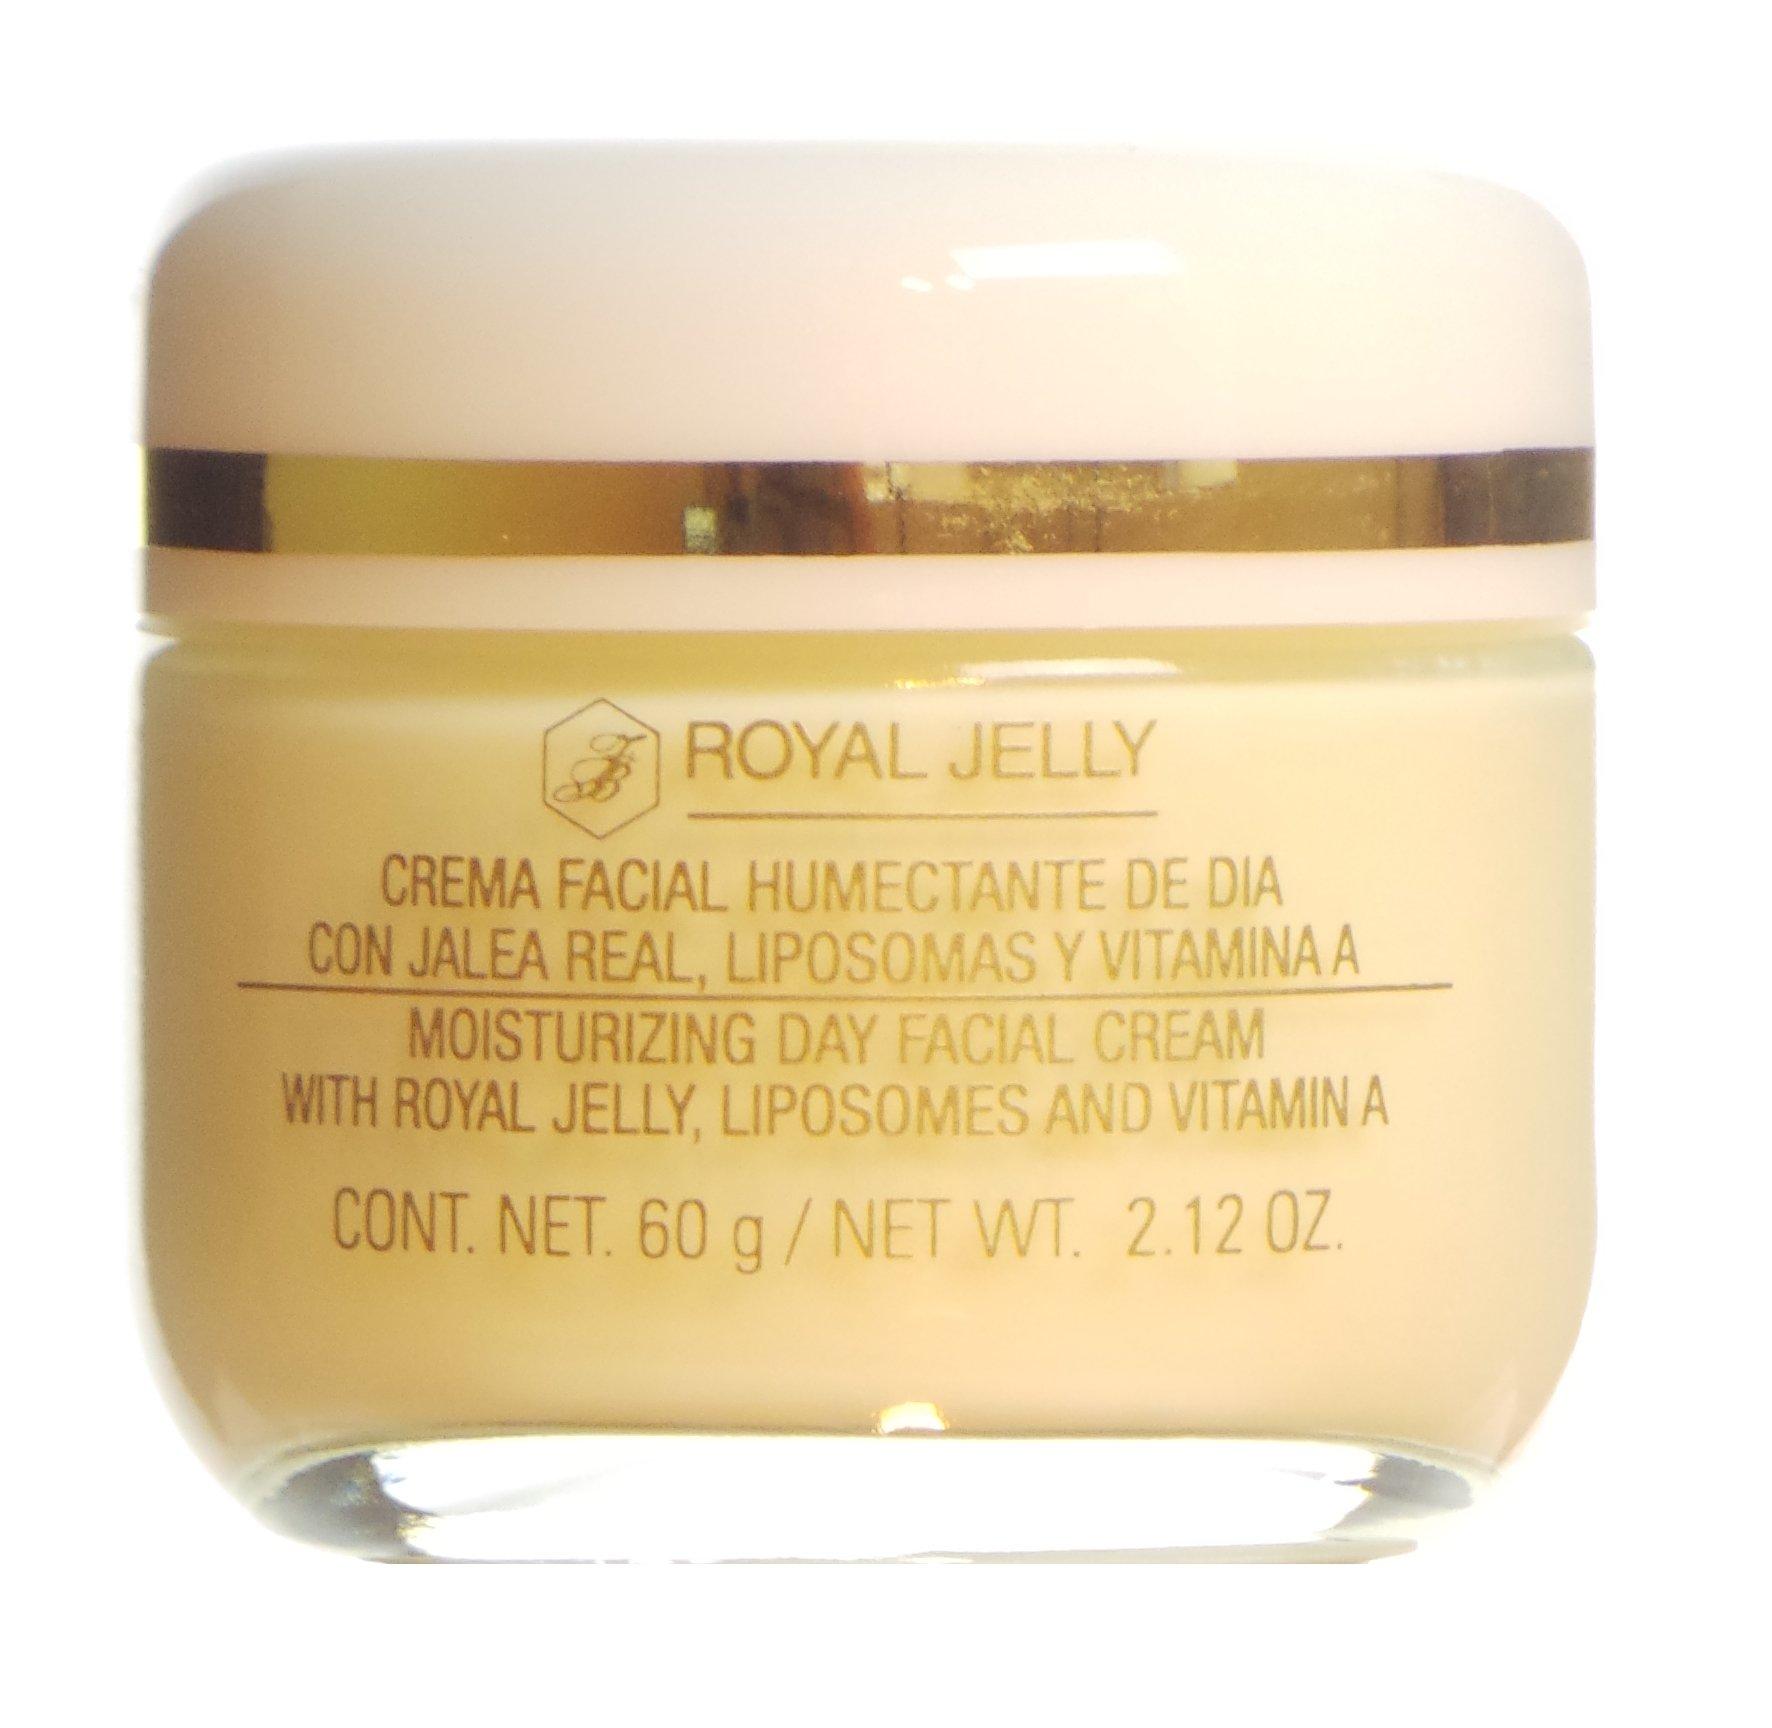 Armand Dupree Moisturizing Facial Cream Day Royal Jelly Liposomes Vitamin A 60 g / 2.12 oz